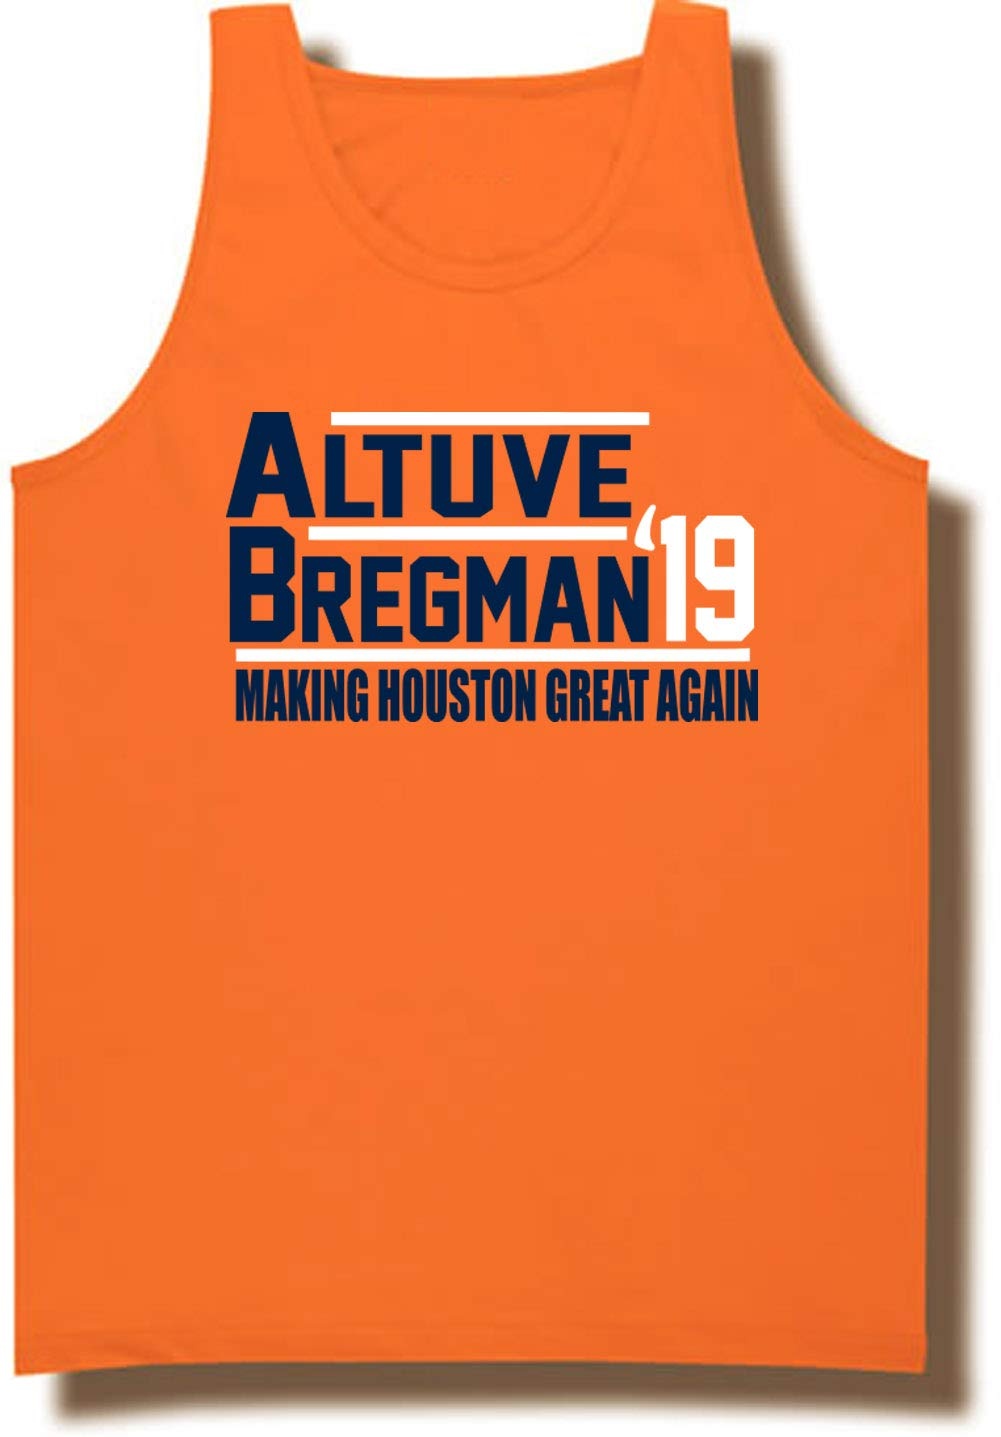 Shedd Orange Houston Altuve Bregman 2019 Shirts